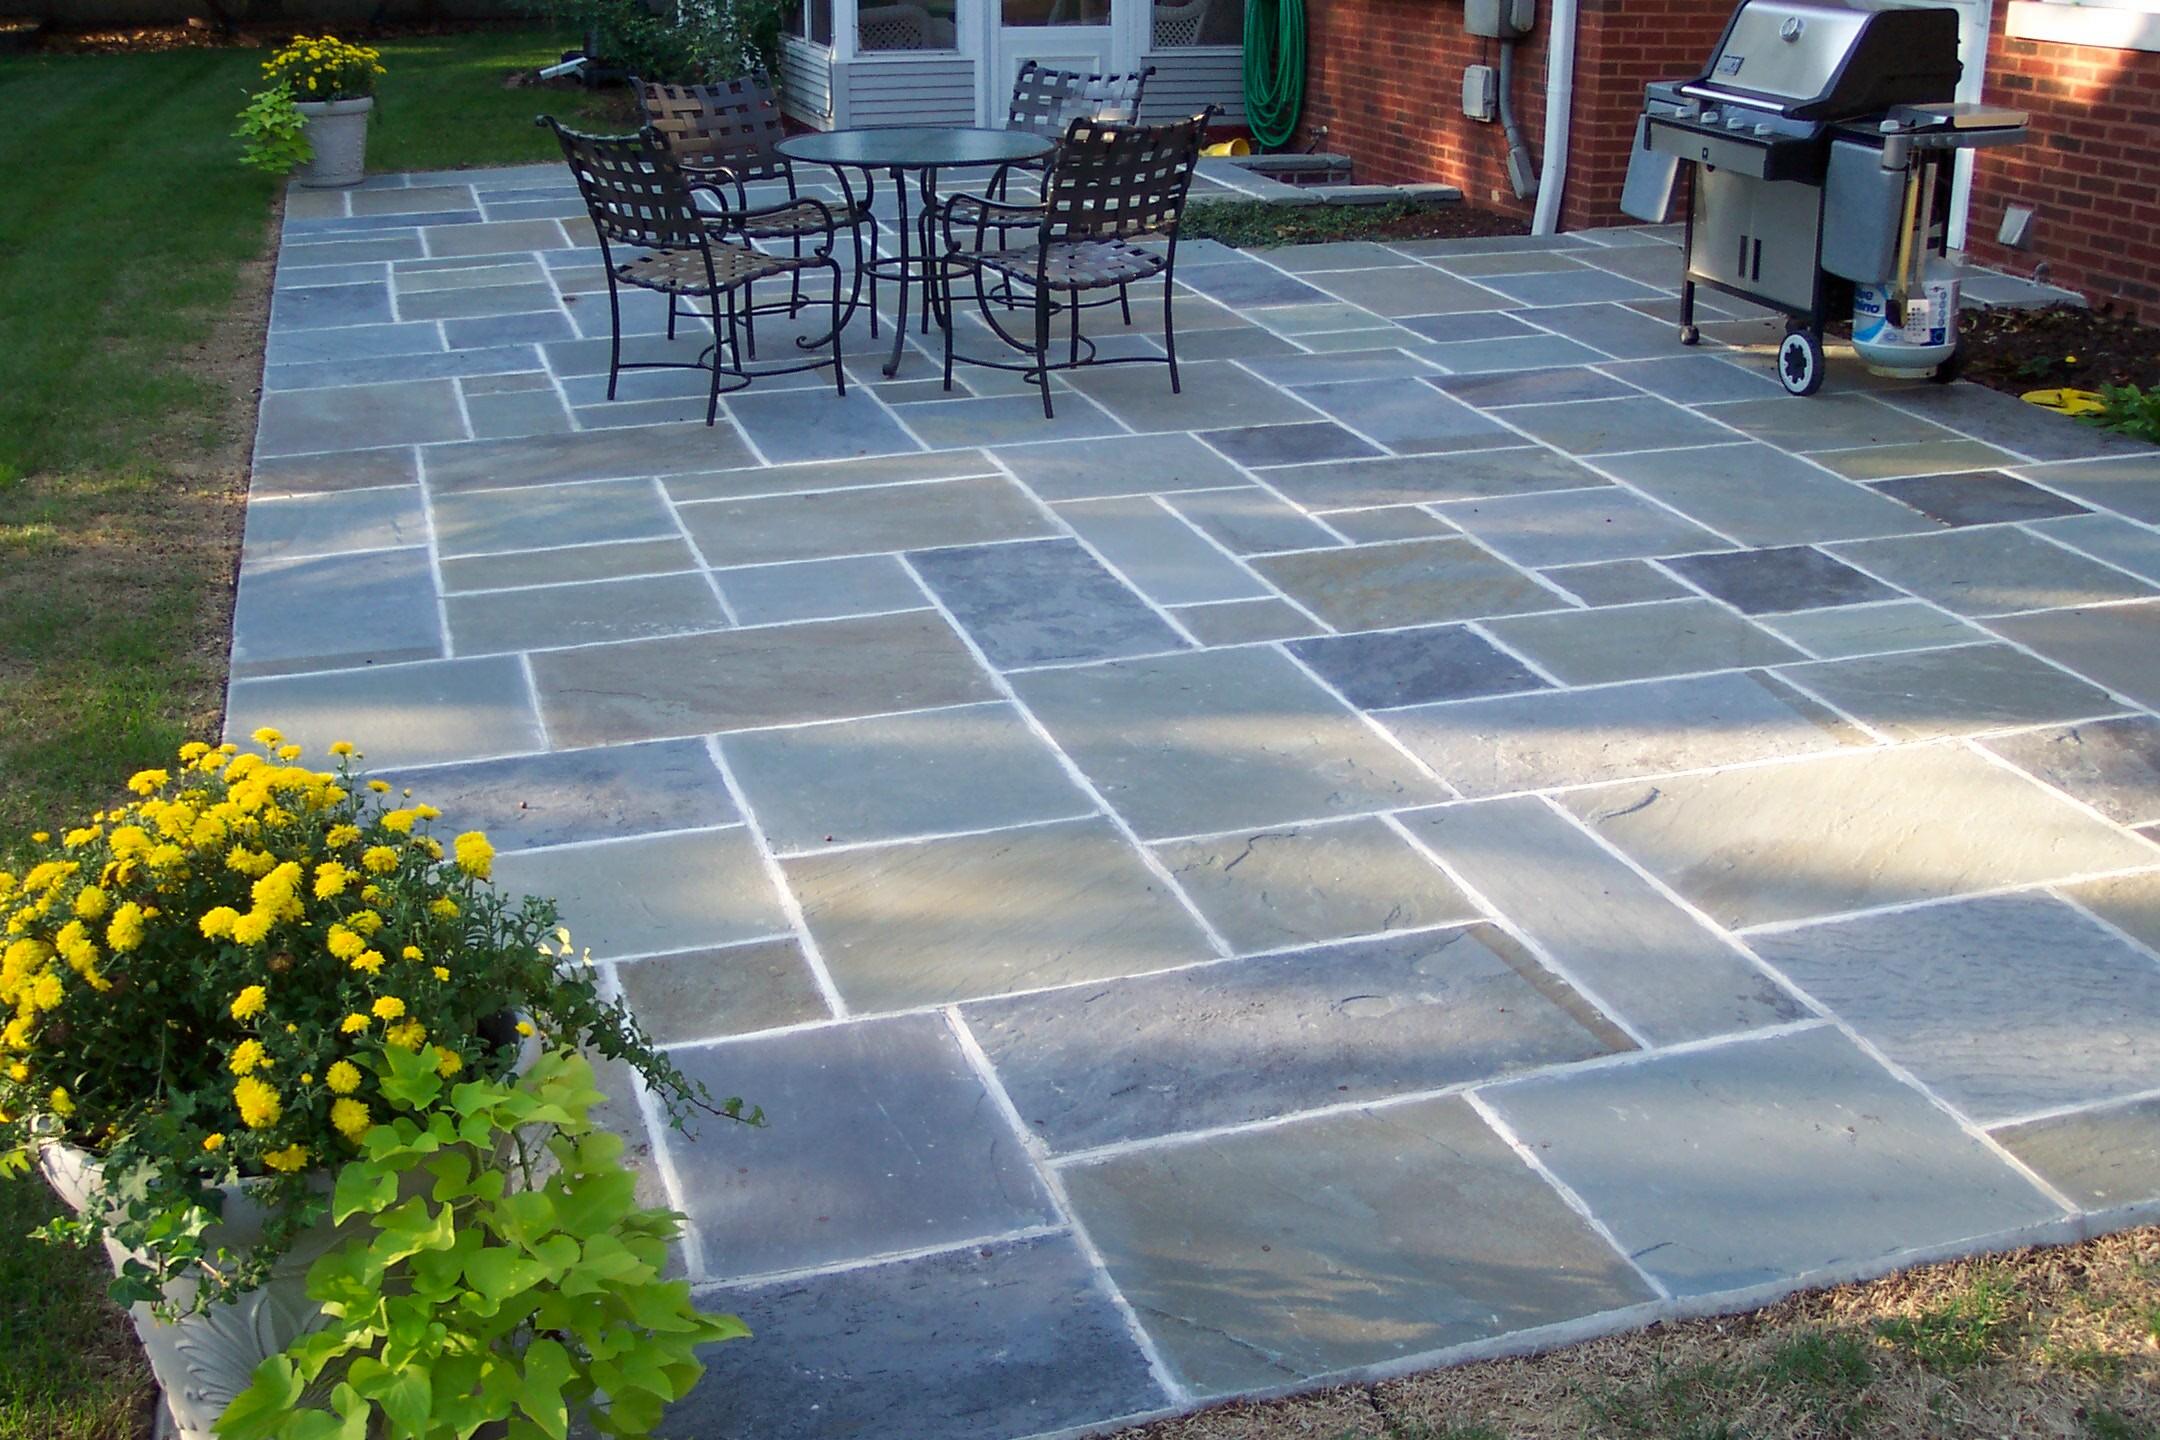 awesome-bluestone-patio-ideas-5-blue-stone-patio-2160-x-1440